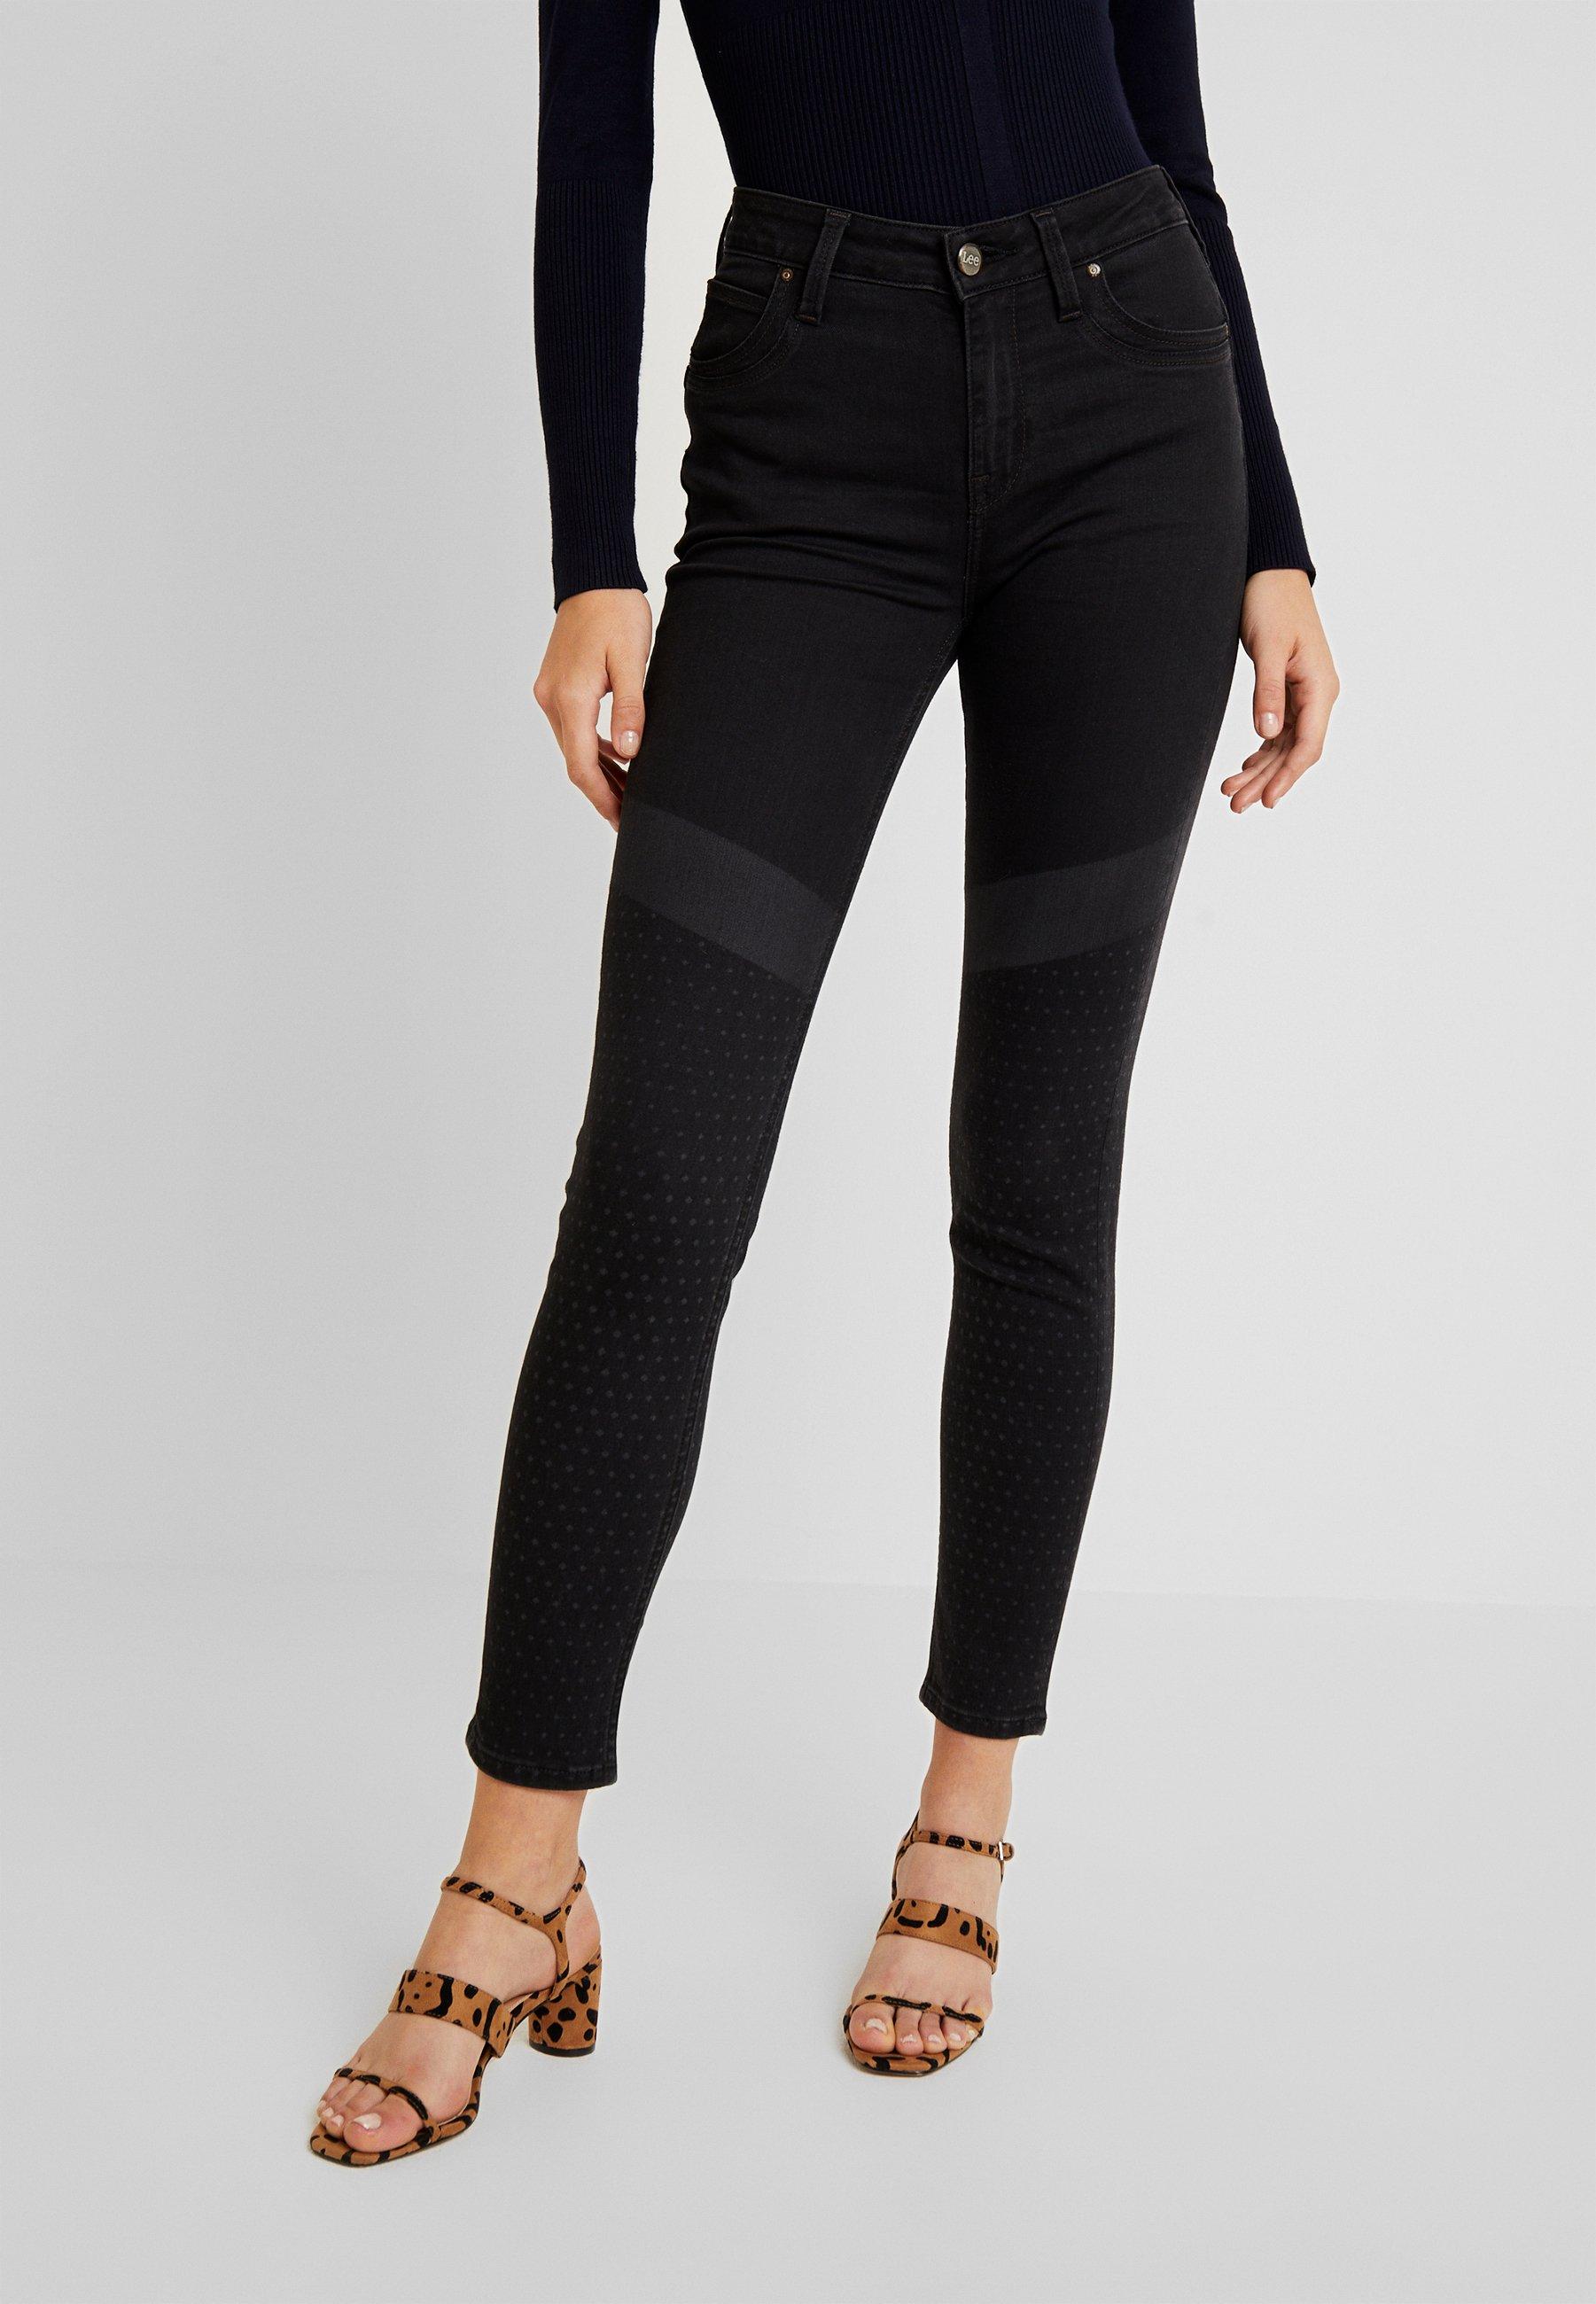 Lee SCARLETT HIGH BODY OPTIX - Jeans Skinny Fit base shade